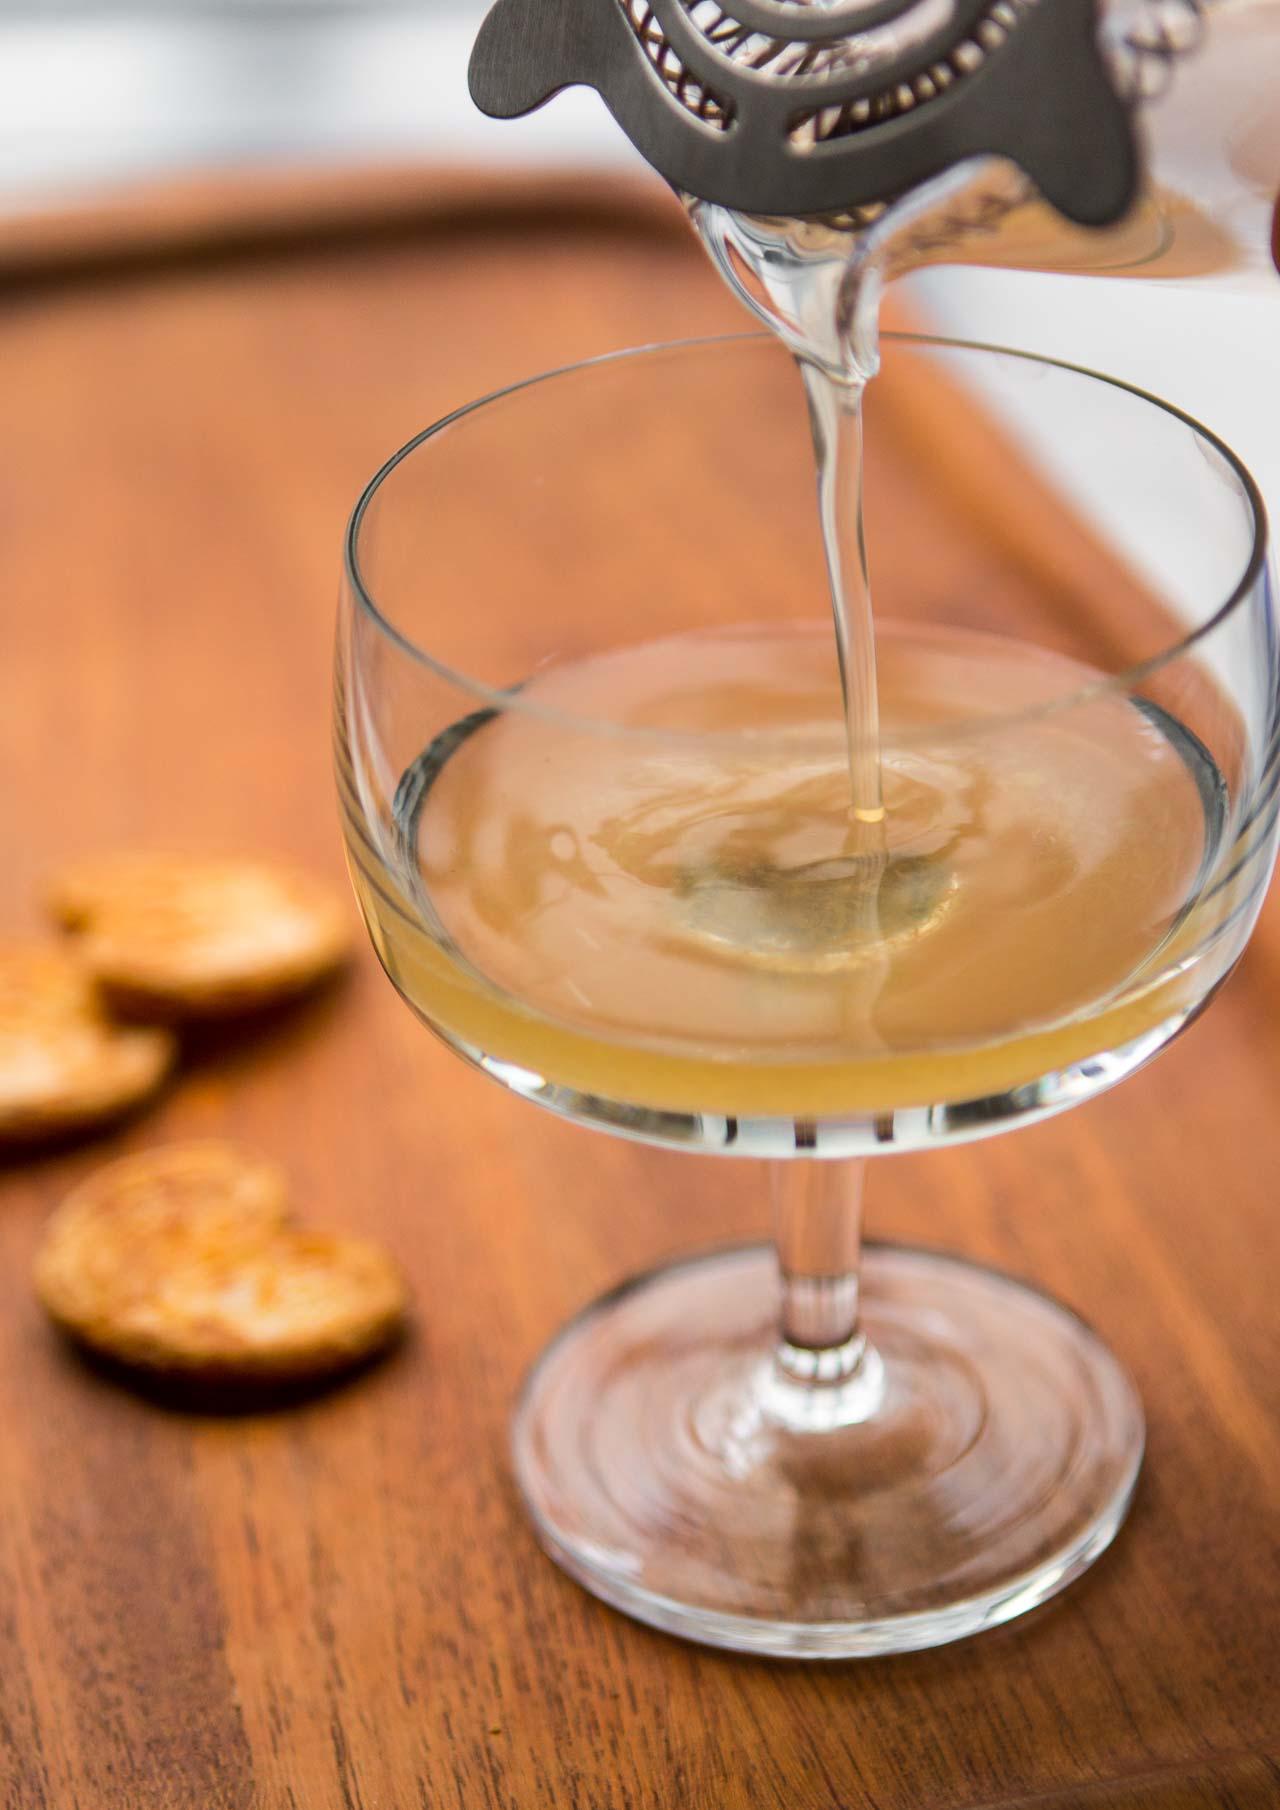 A delicious vintage cocktail with gin, lemon juice and noyau (almond) liqueur